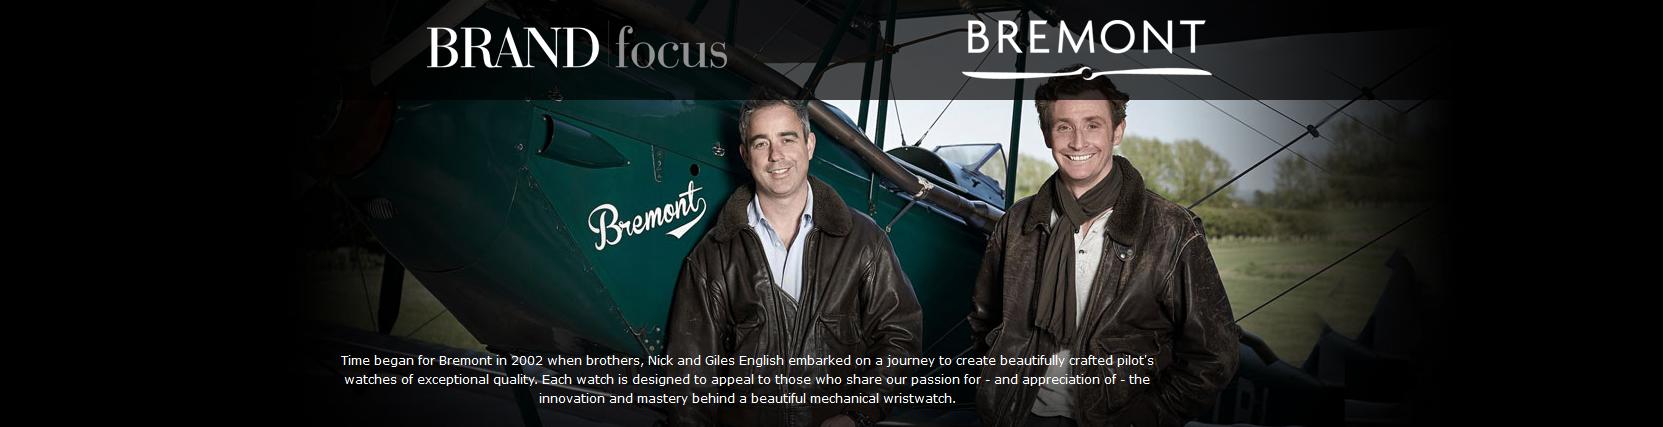 Screenshot-2018-2-3 Bremont Brand Focus Beaverbrooks the Jewellers.png